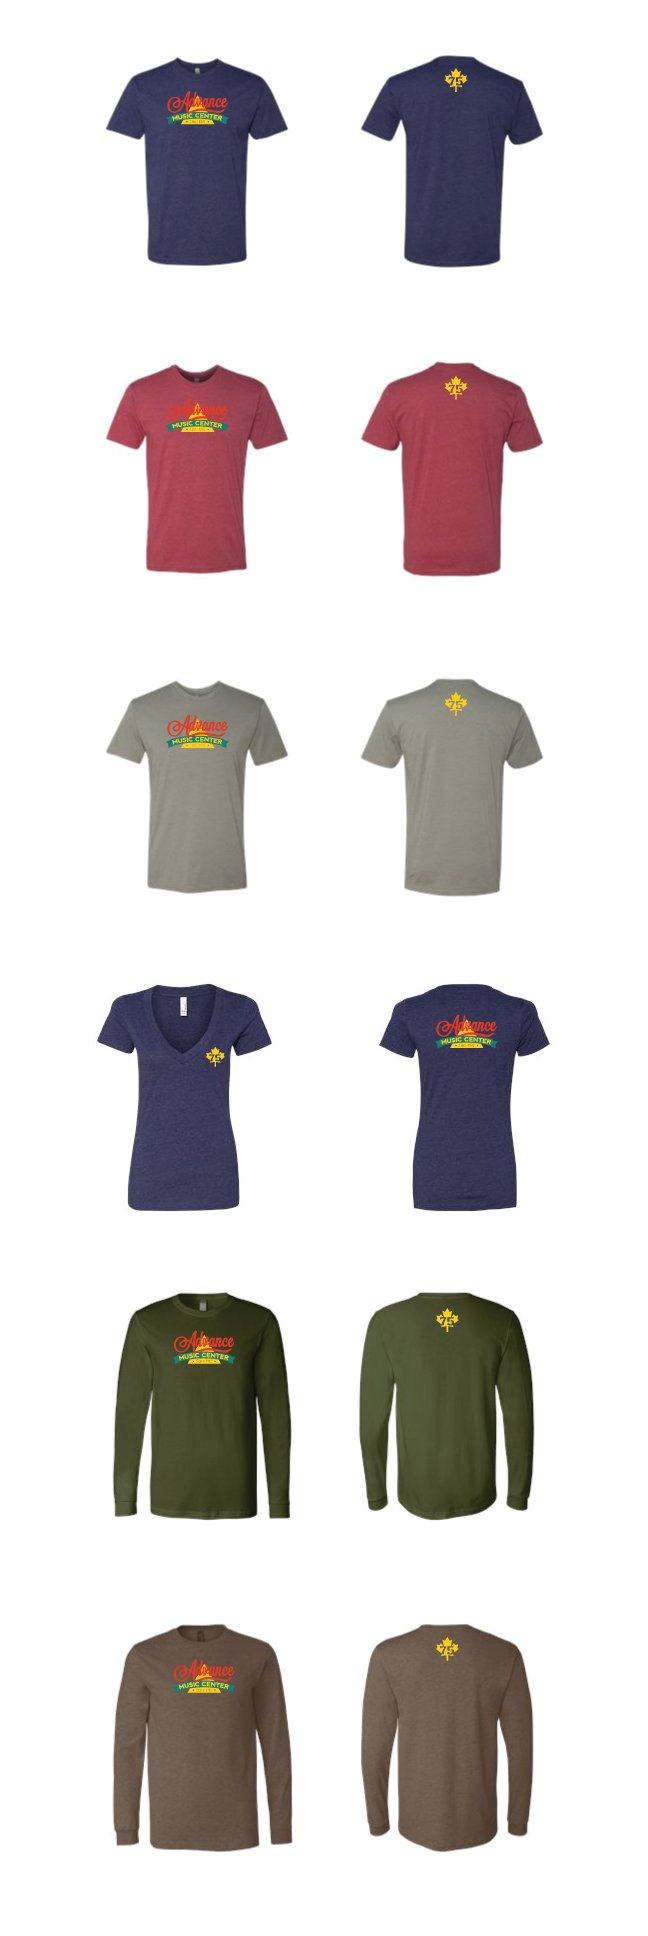 advance music burlington vt custom t-shirts screen printing